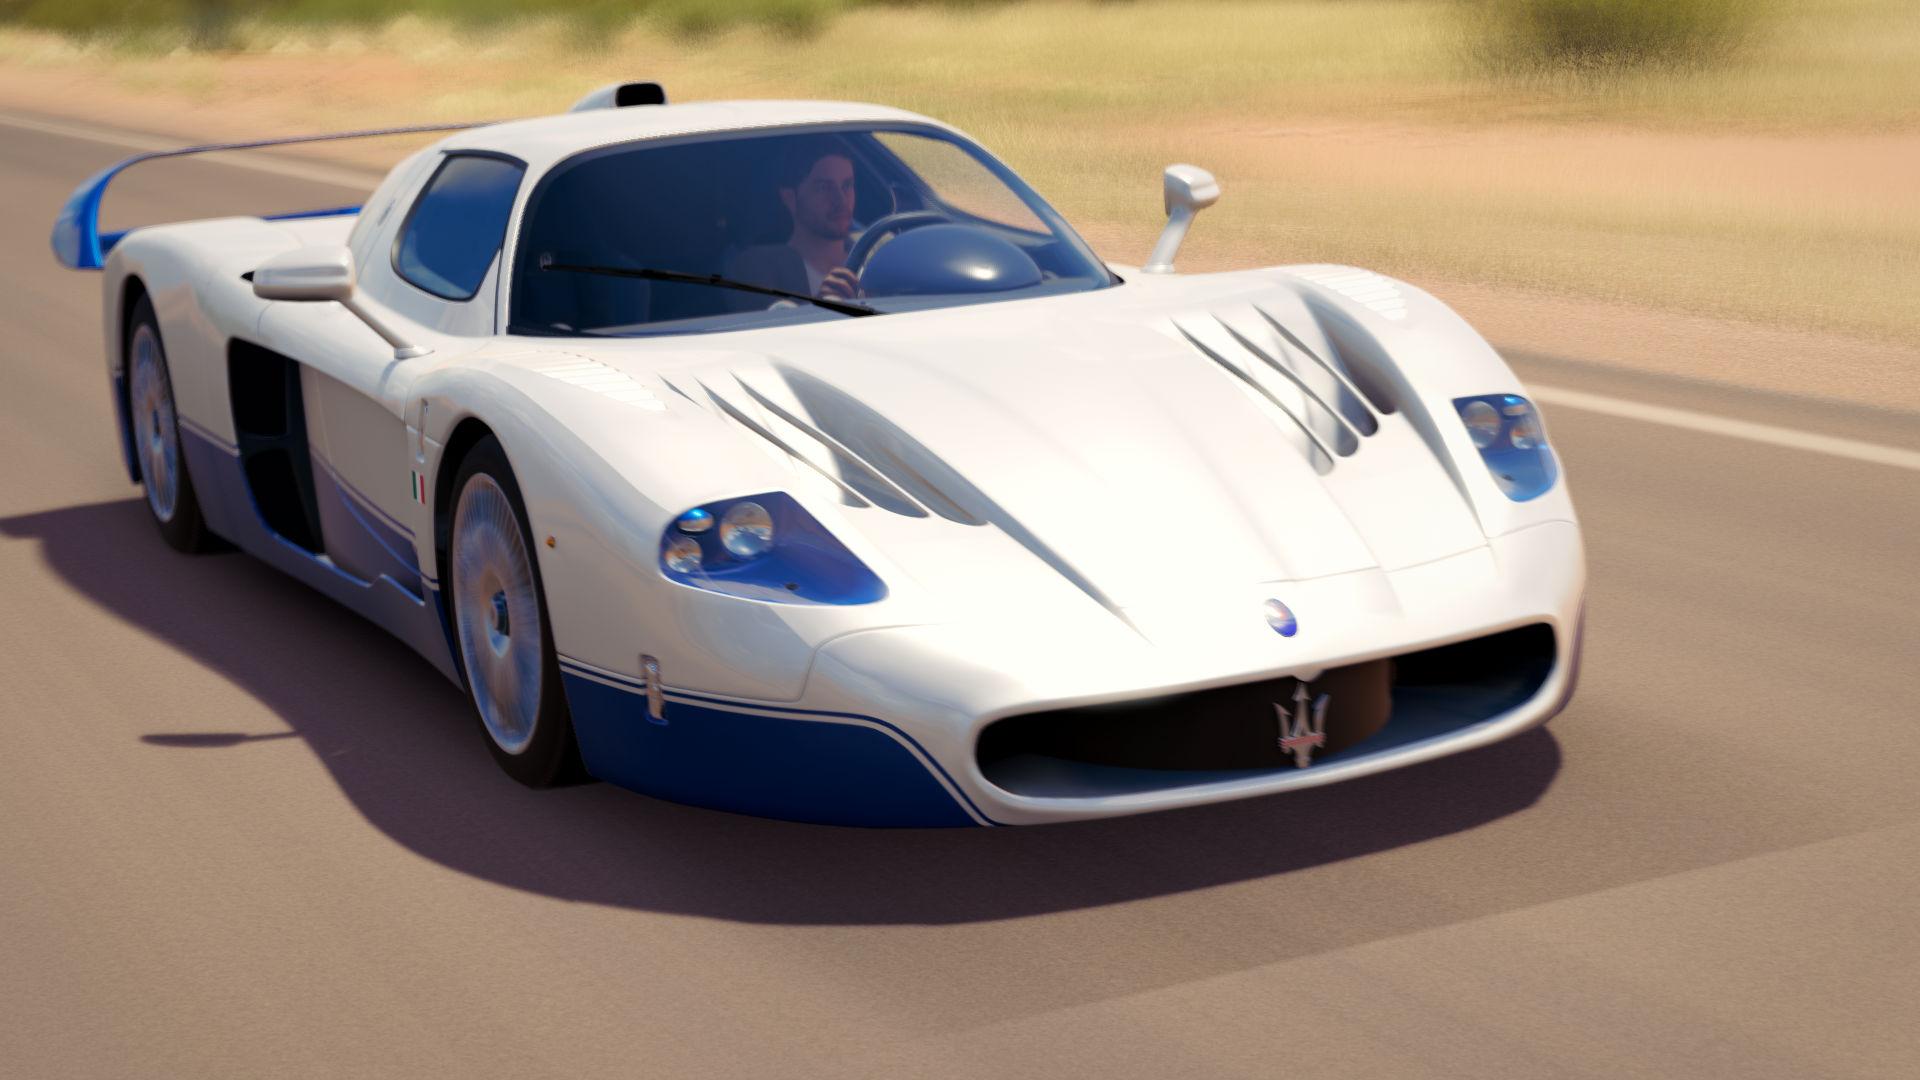 https://vignette.wikia.nocookie.net/forzamotorsport/images/5/56/FH3_Maserati_MC12.jpg/revision/latest?cb=20170724163709